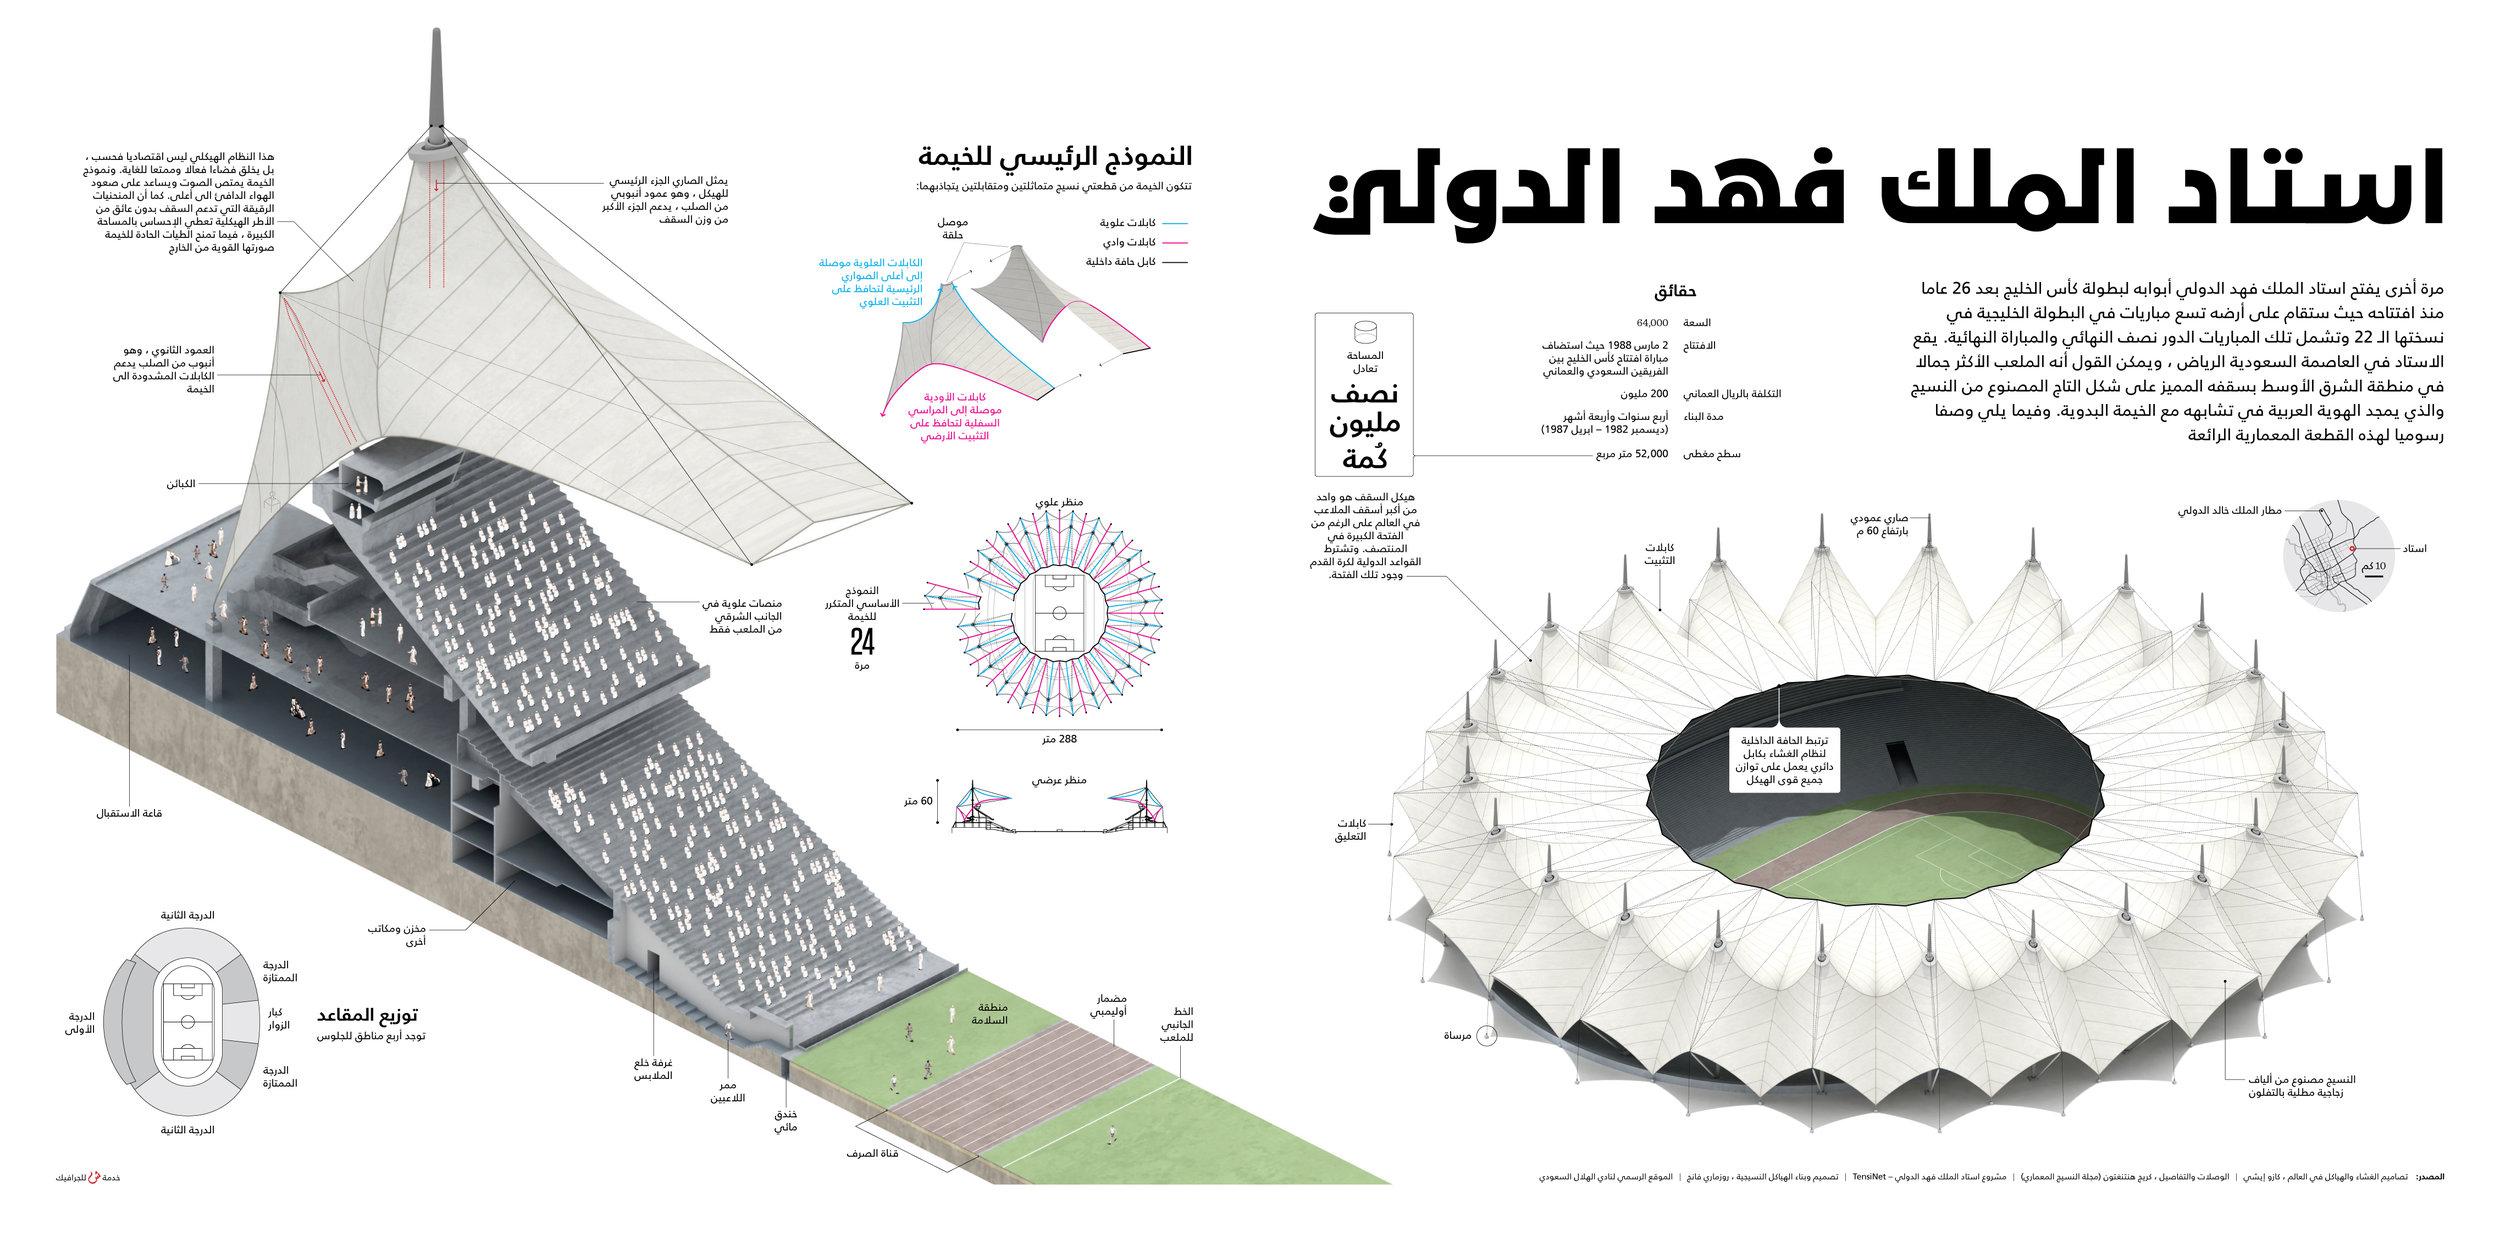 King-Fahd-International-Stadium design arabic.jpg